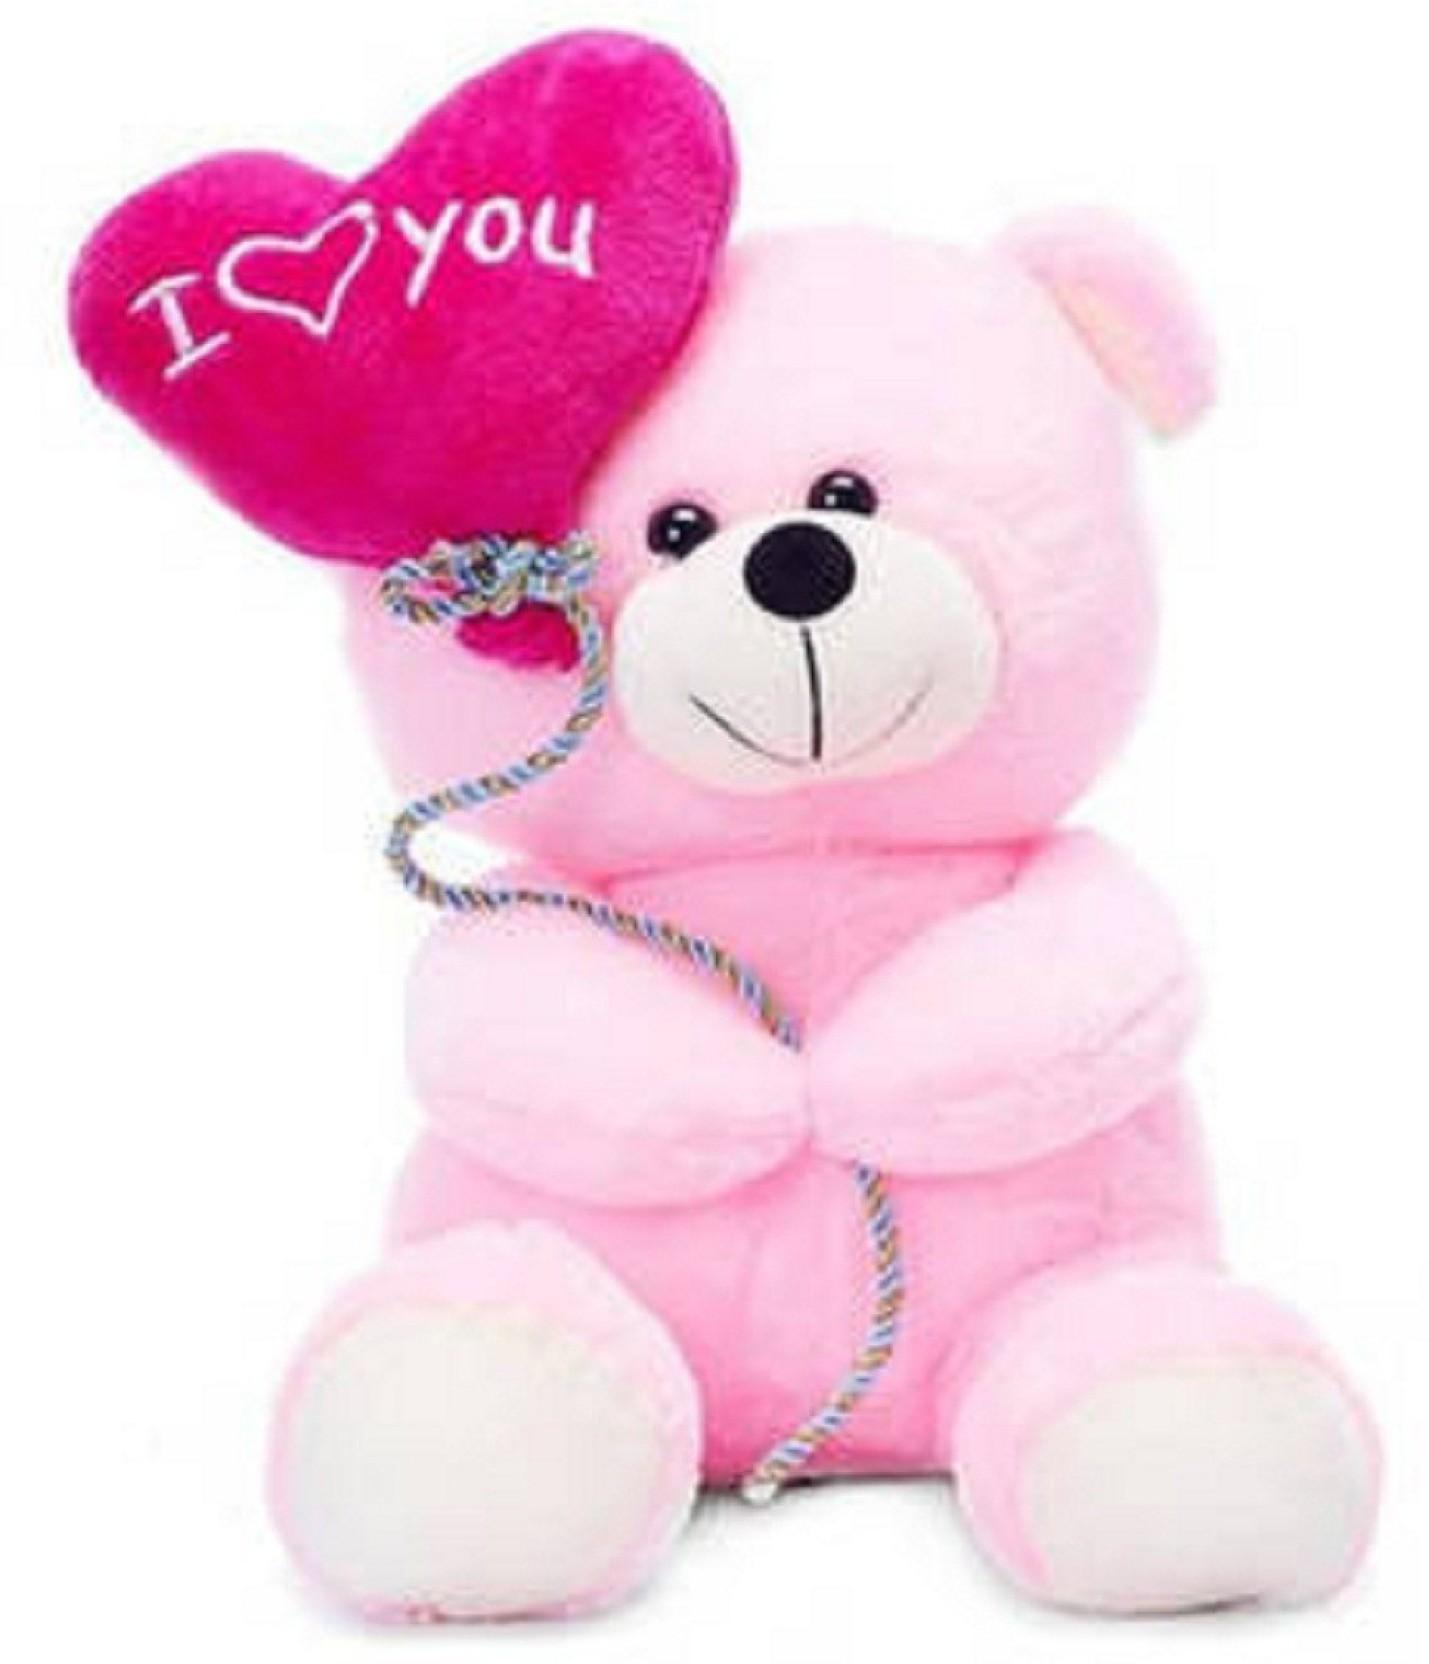 2c563c294d1e stuffed toy 25 cm little soft and cute teddy - 25 cm - 25 cm little ...